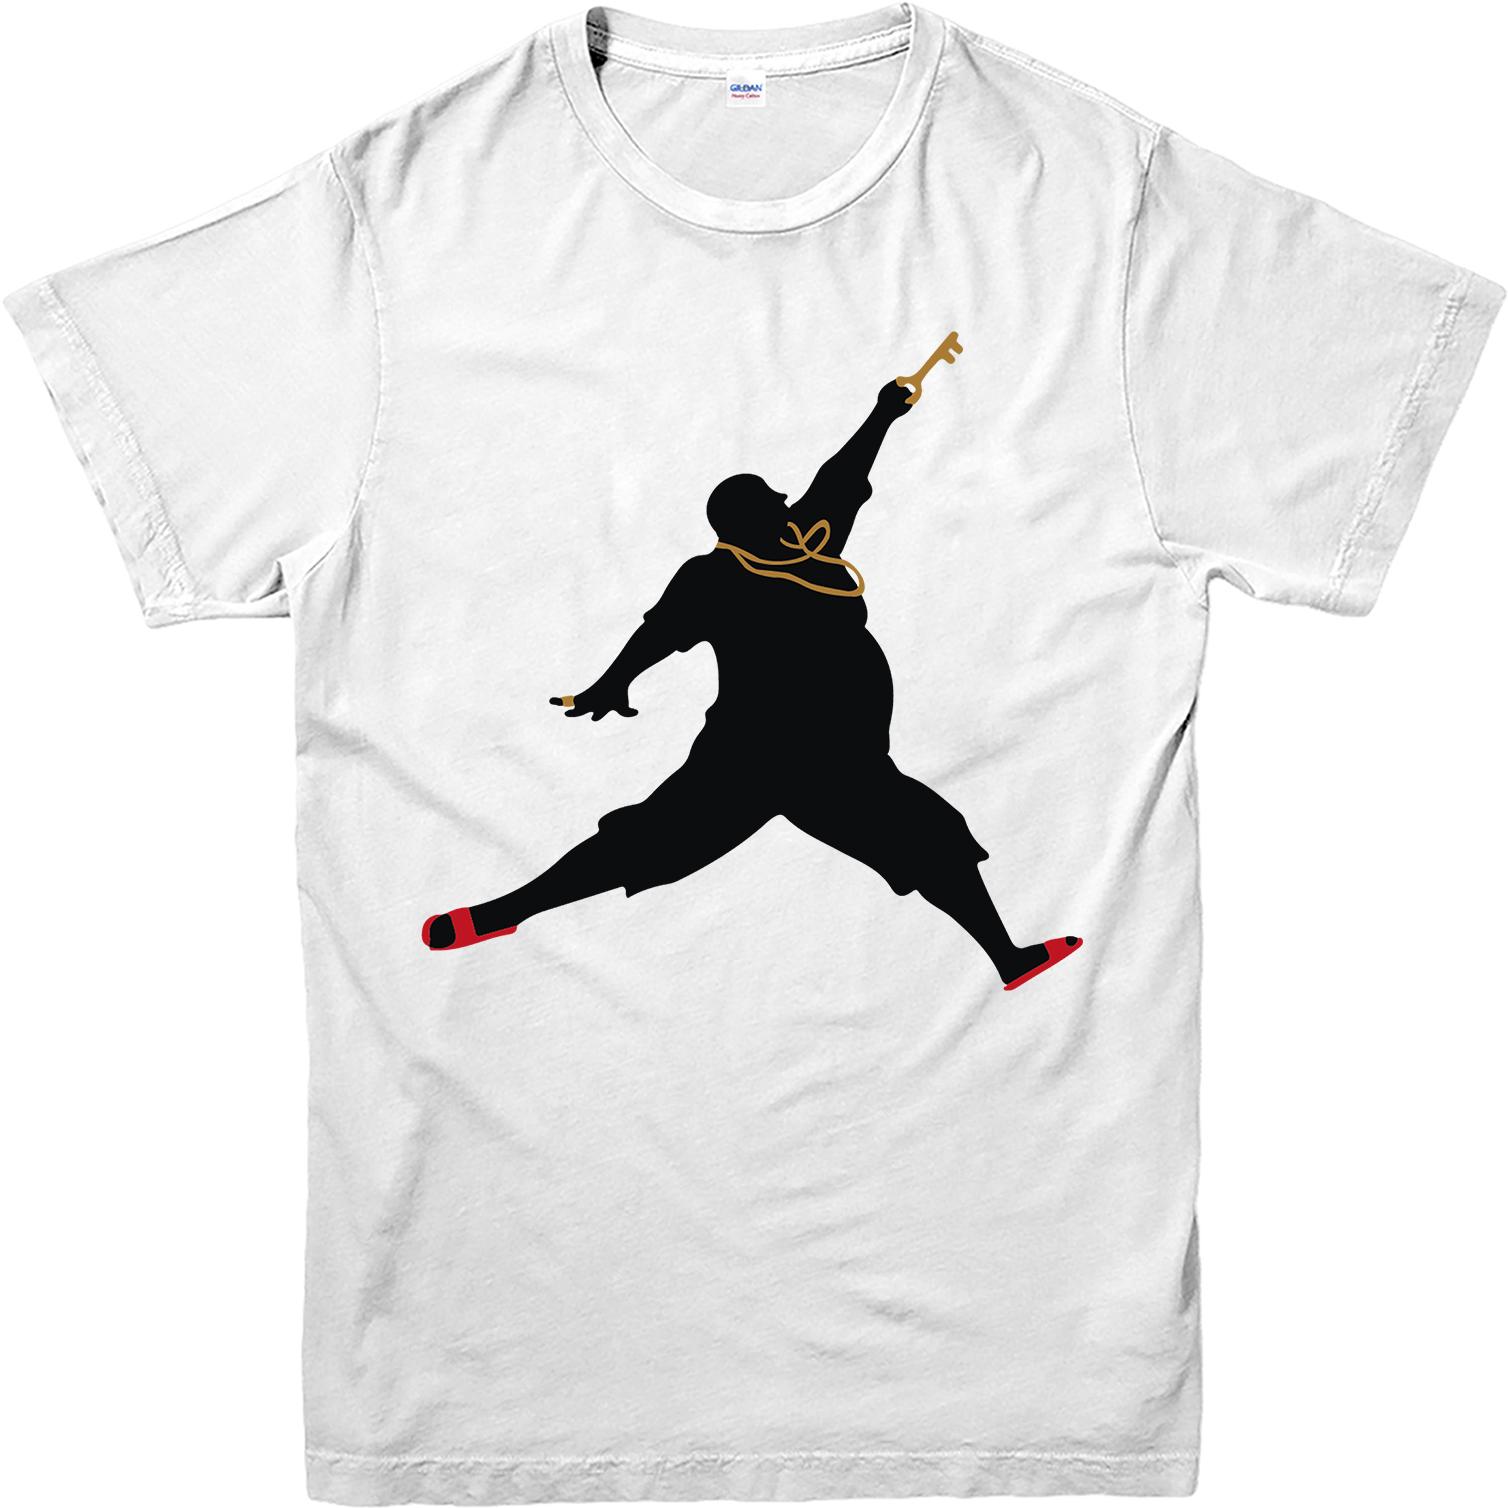 T shirt design jordan - Dj Khaled T Shirt Jordan Logo Spoof T